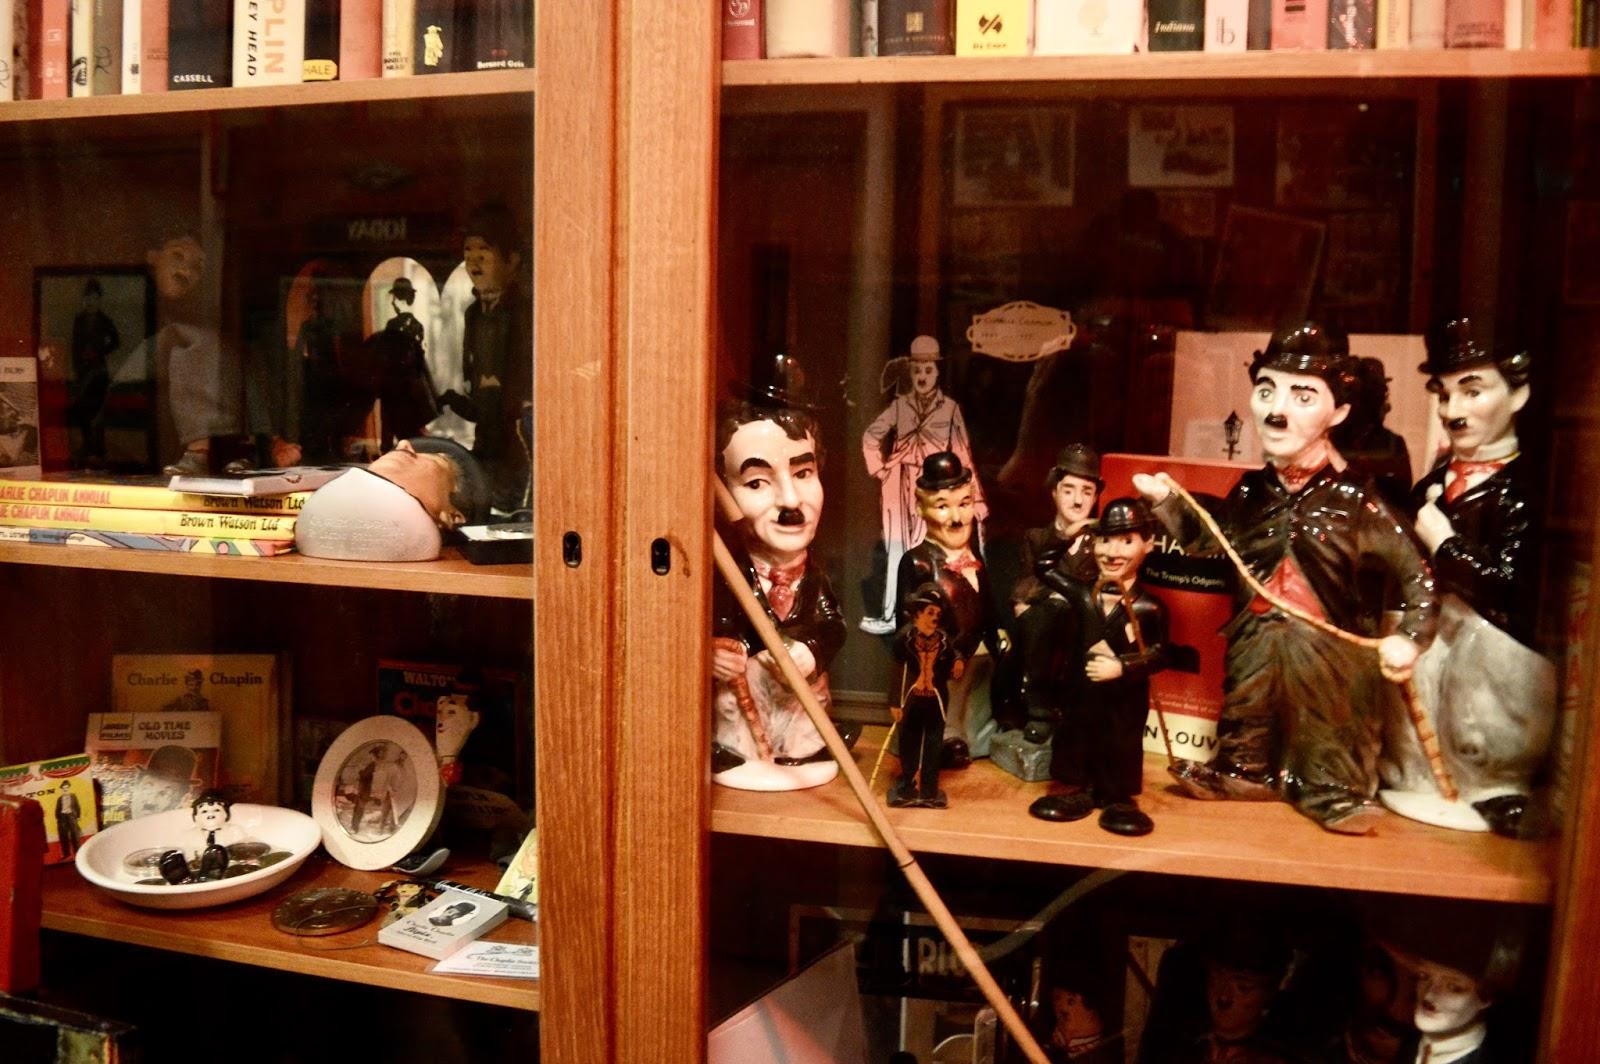 Charlie Chaplin Cinema Museum